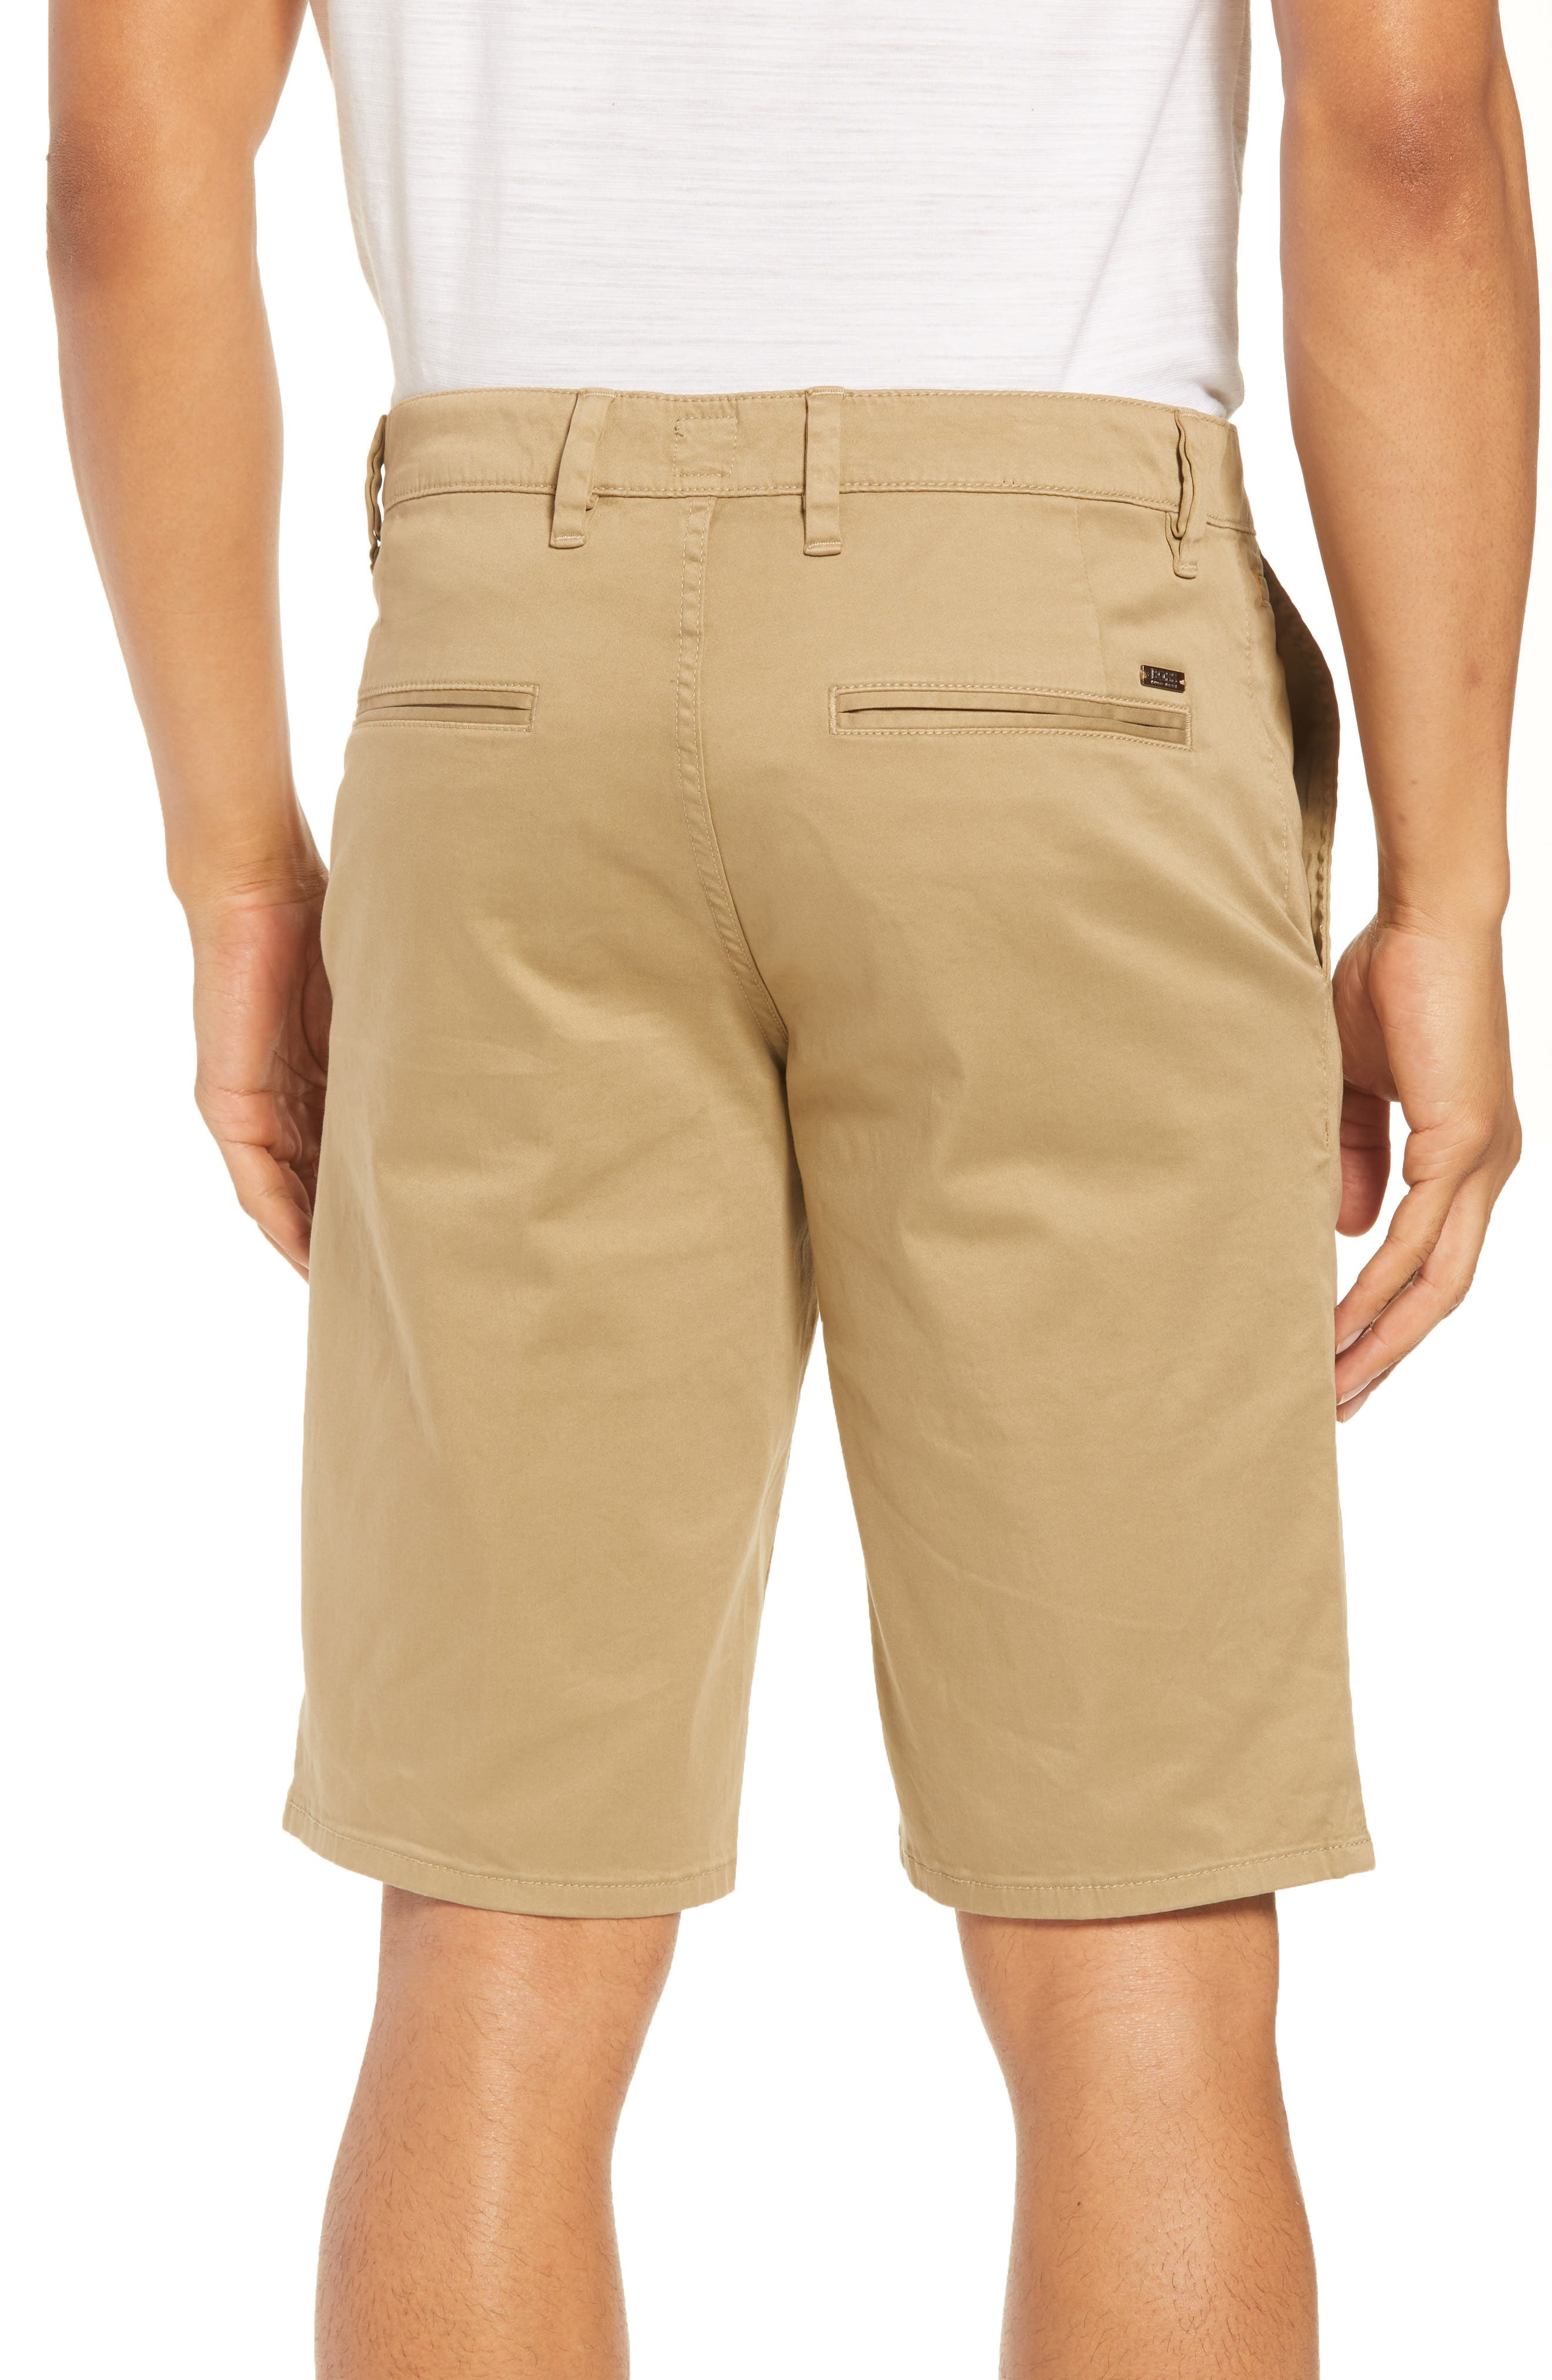 Slim Fit Shorts,                             Alternate thumbnail 2, color,                             200